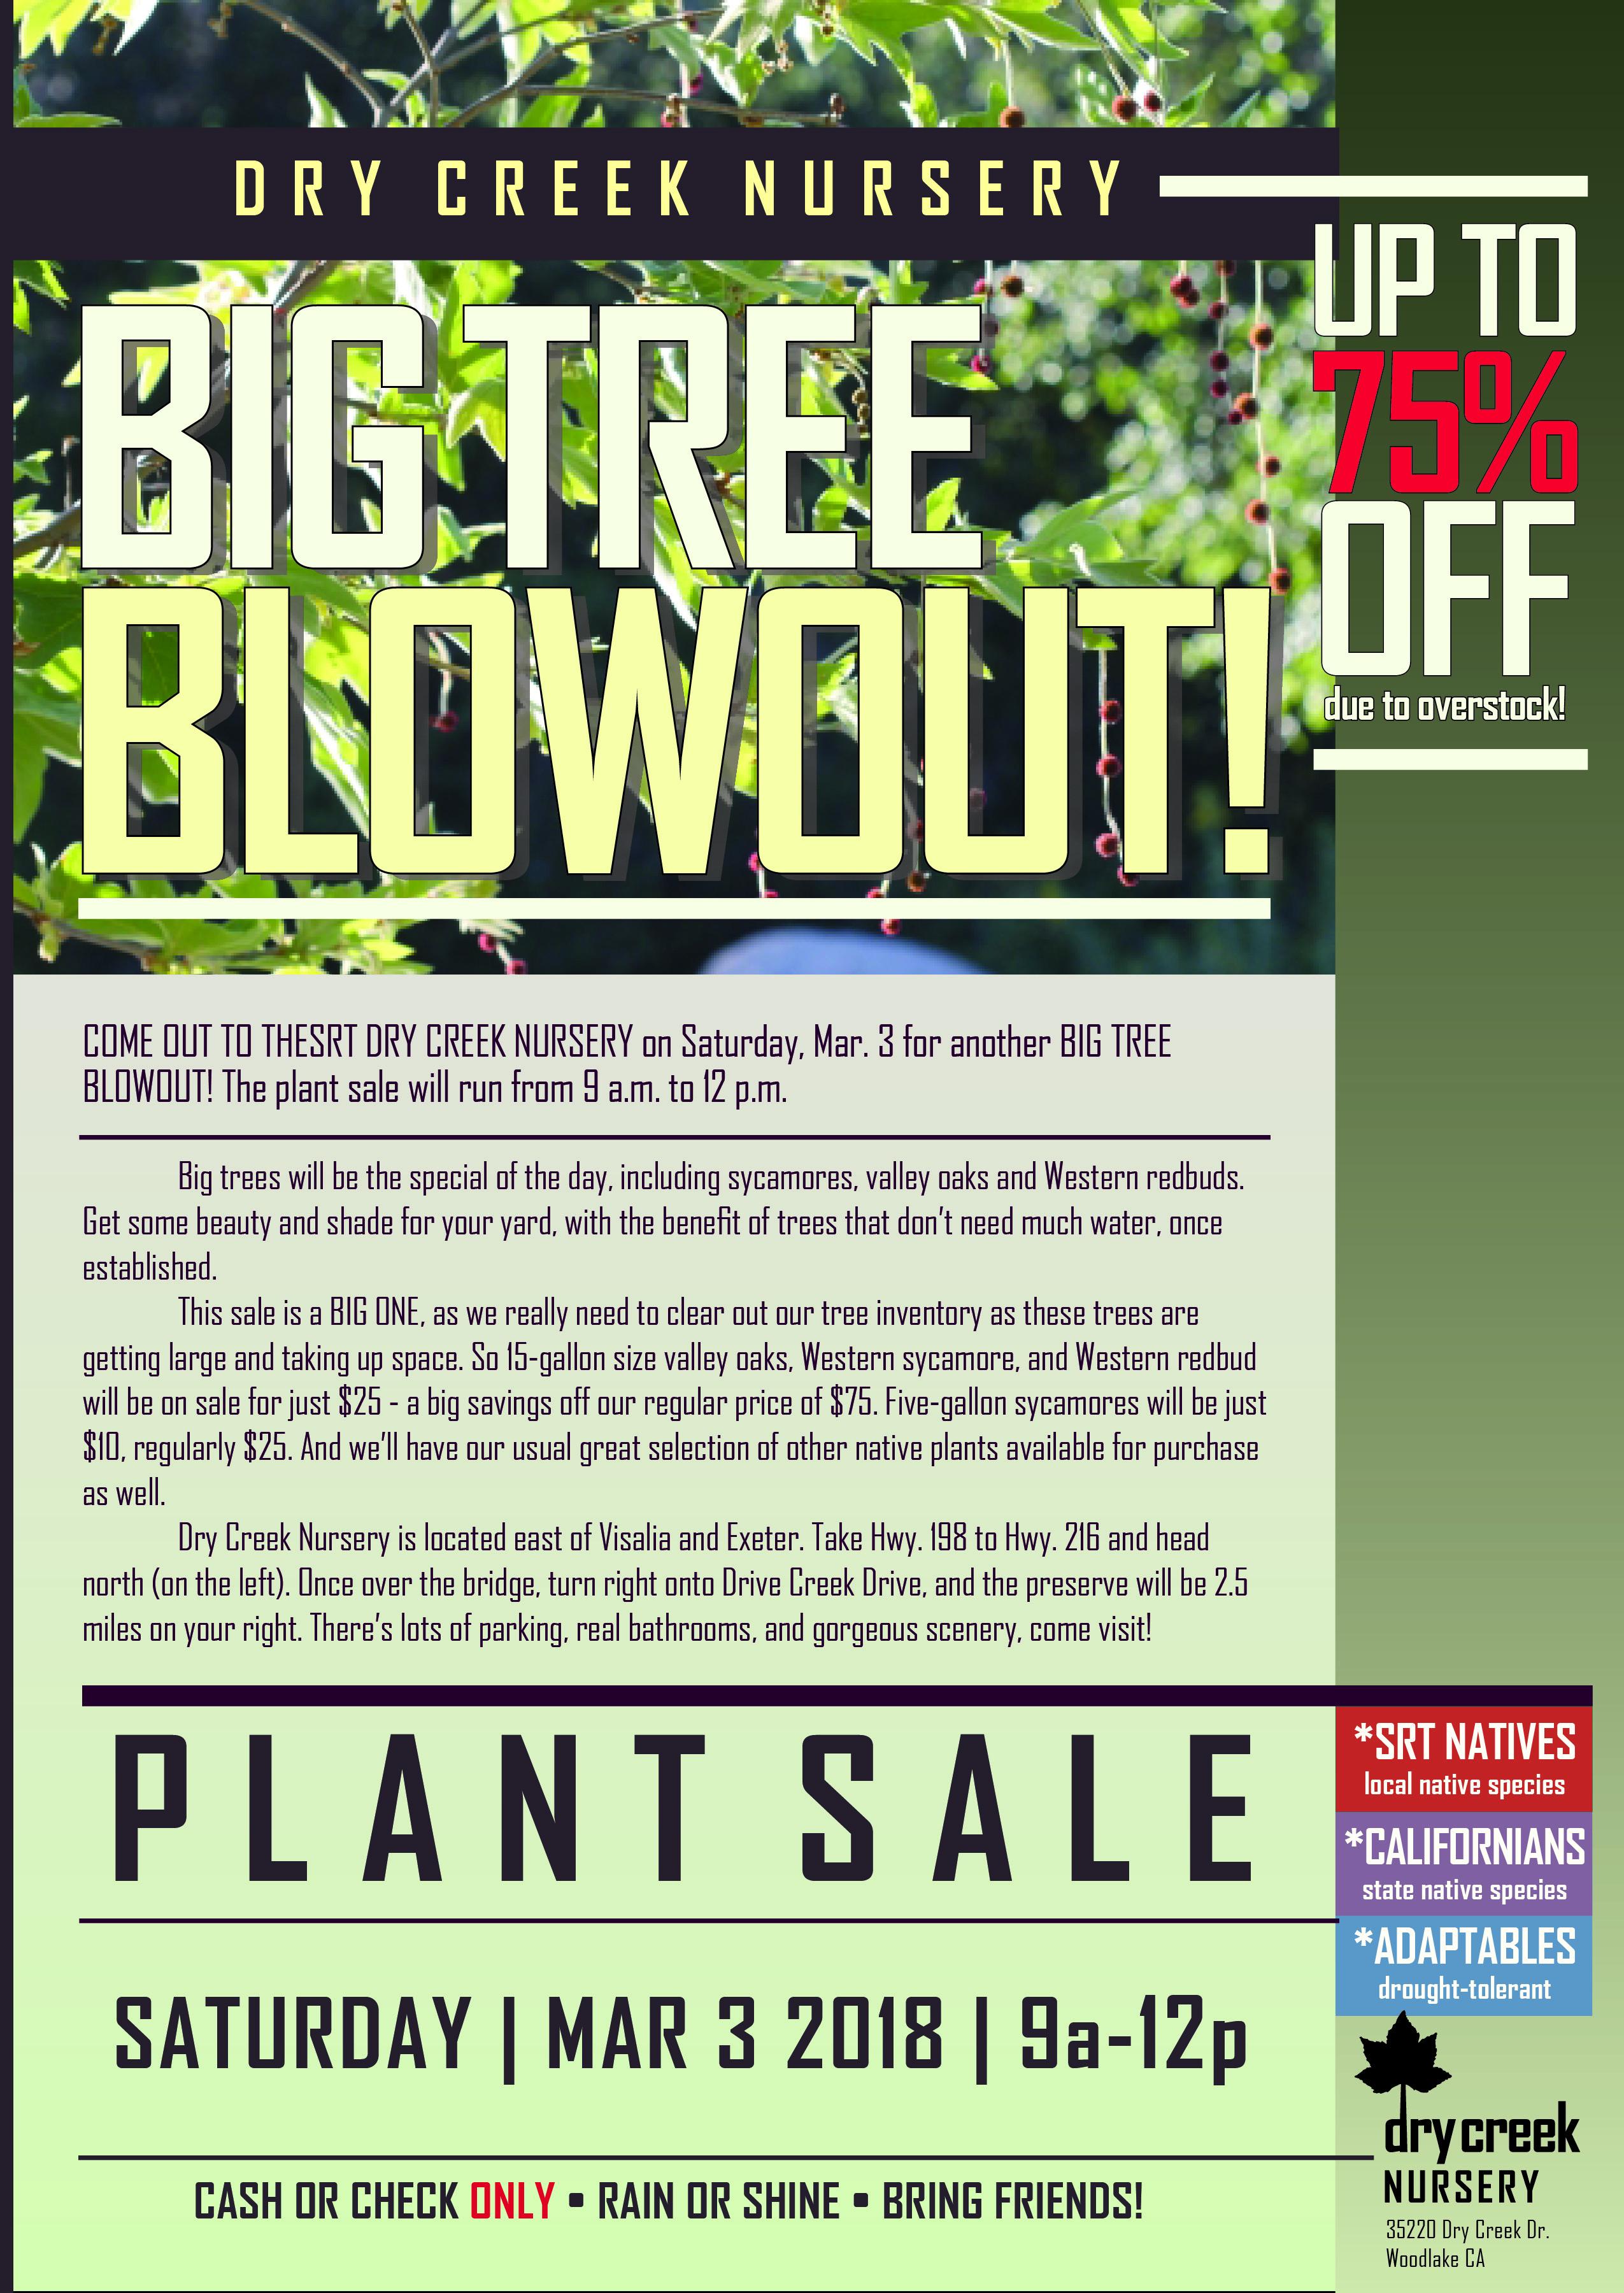 BIG TREE BLOWOUT returns to SRT Dry Creek Nursery Mar. 3